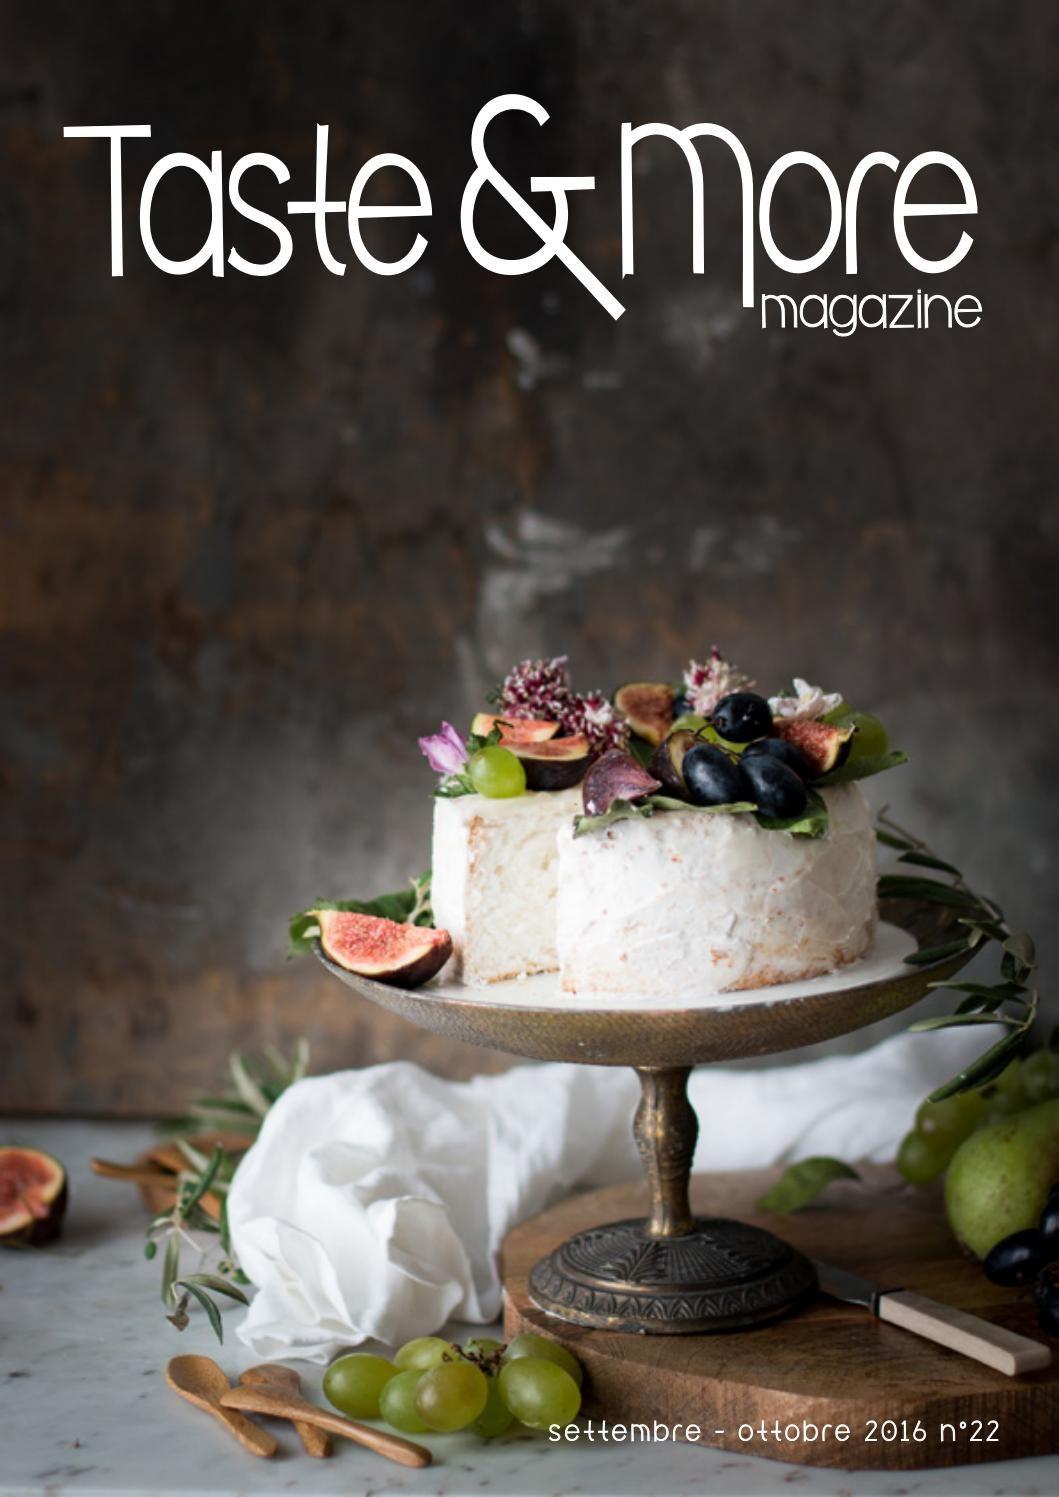 Taste & More Magazine settembre ottobre 2016 n°22 Food